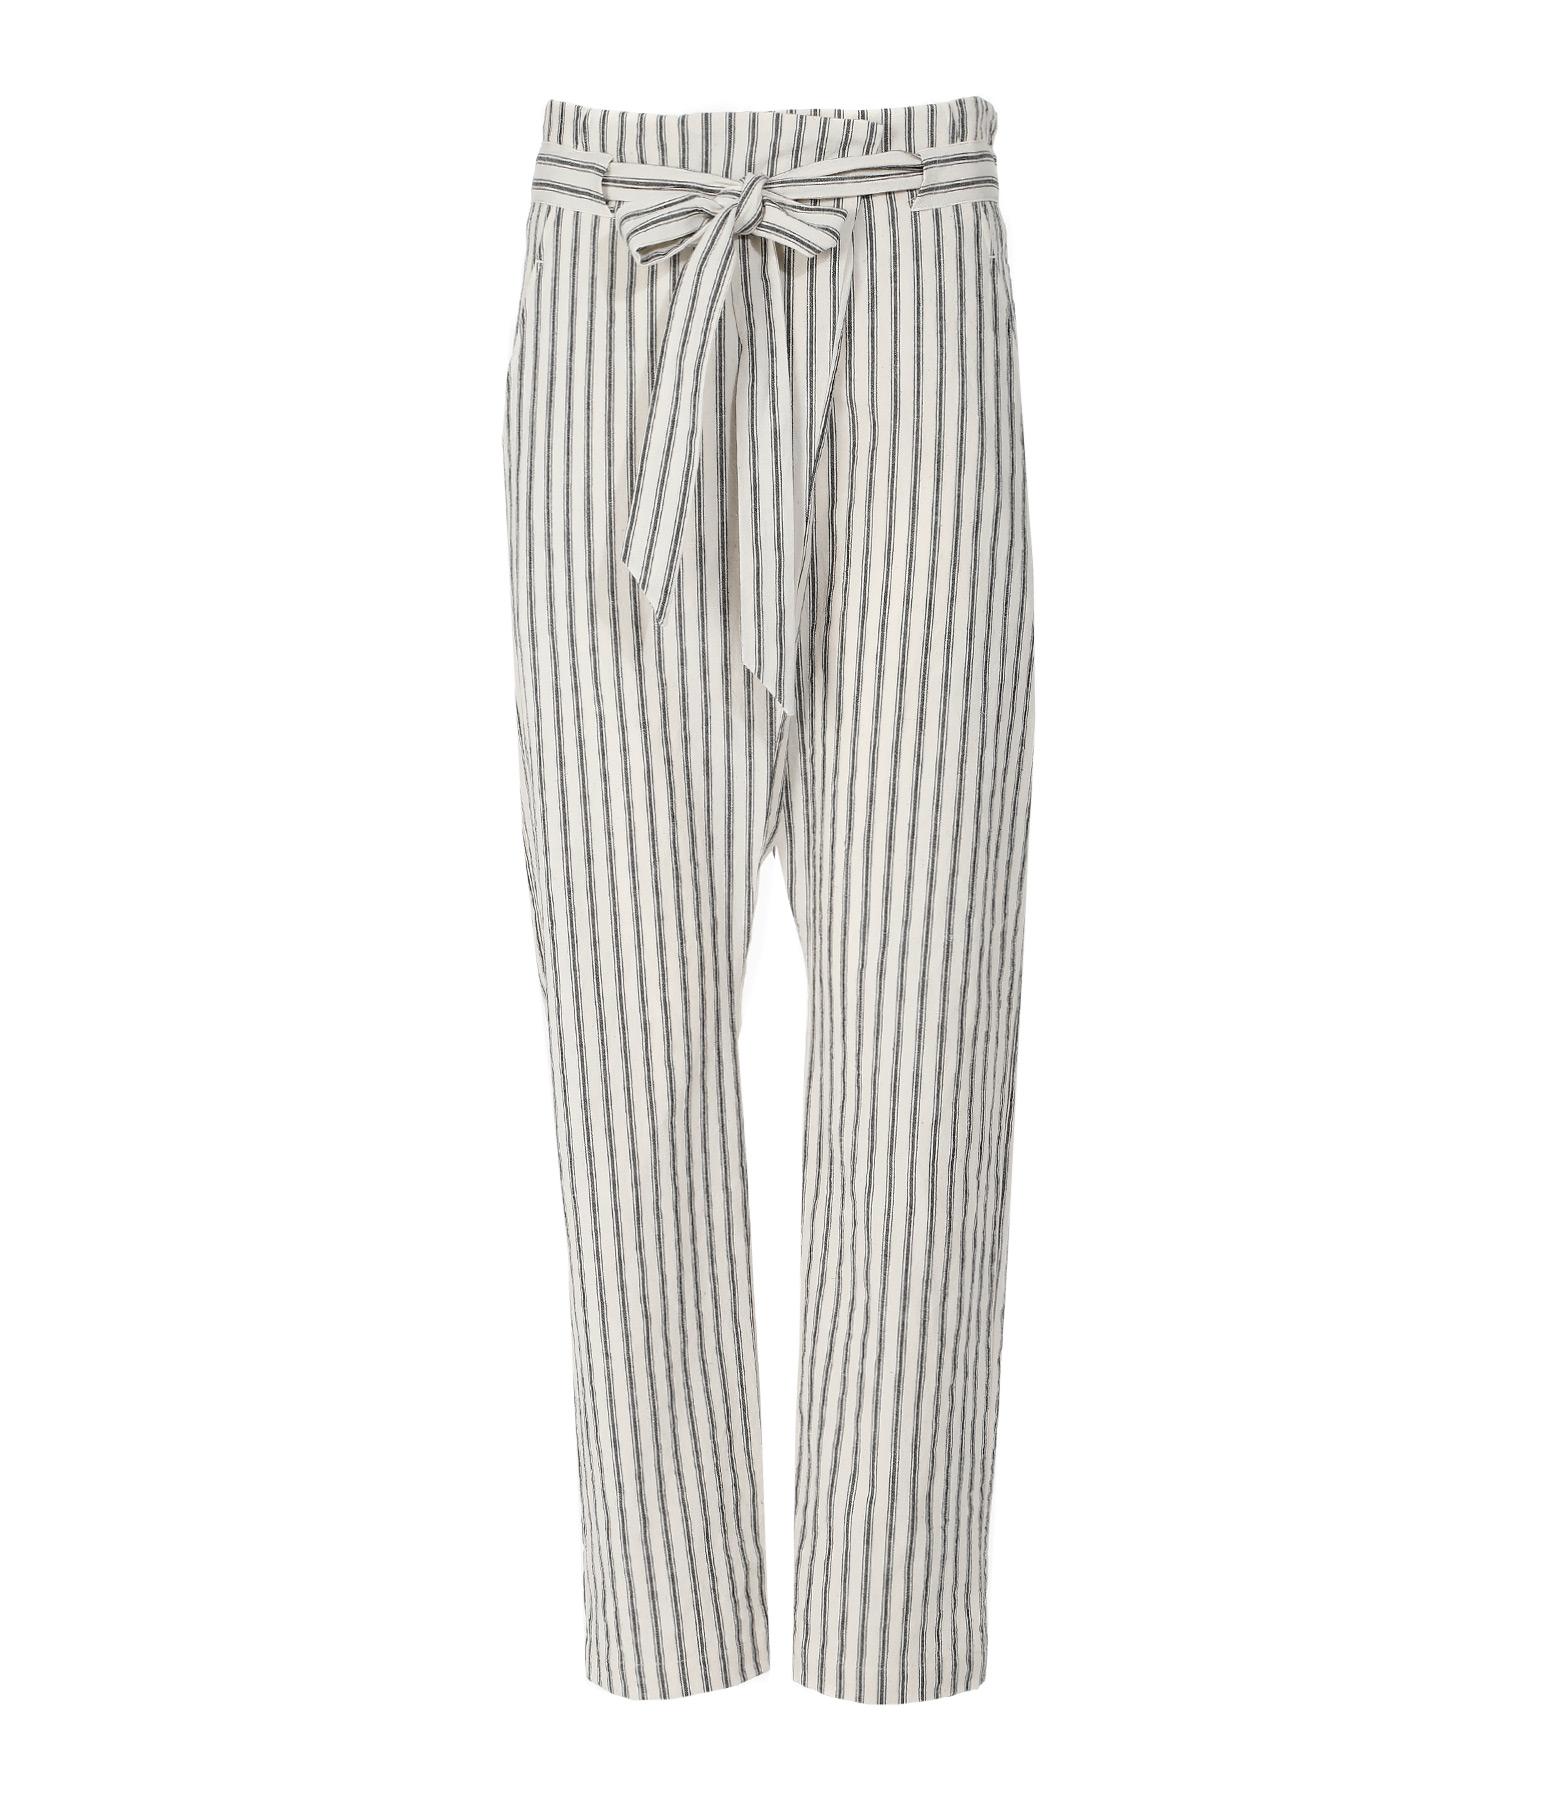 Pantalon Coton Rayures Ecru